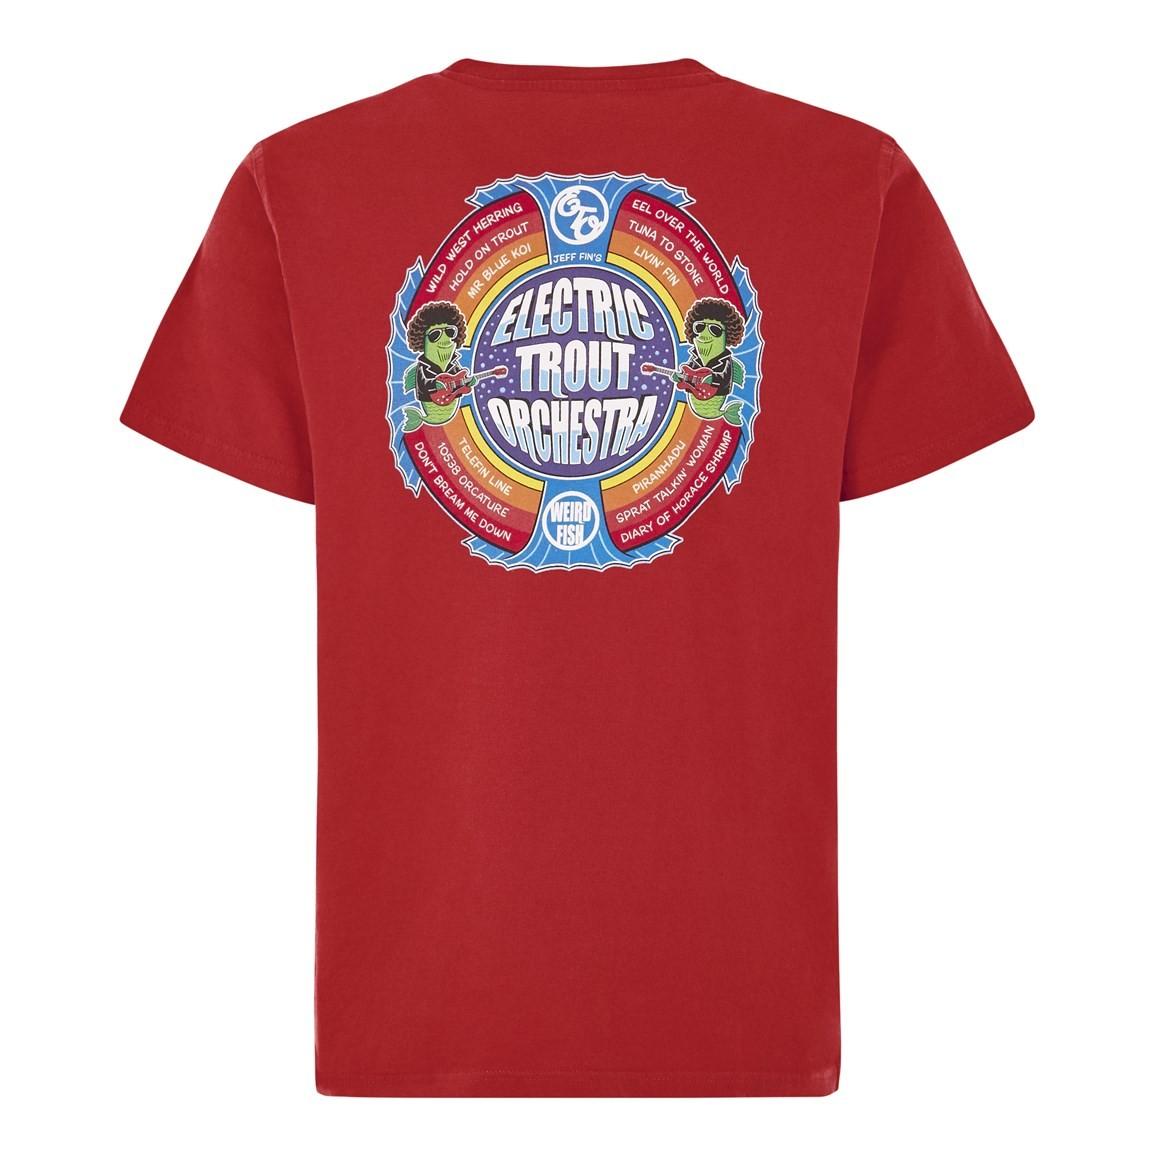 Weird Fish Electric Trout Artist T-Shirt Dark Red Size 5XL